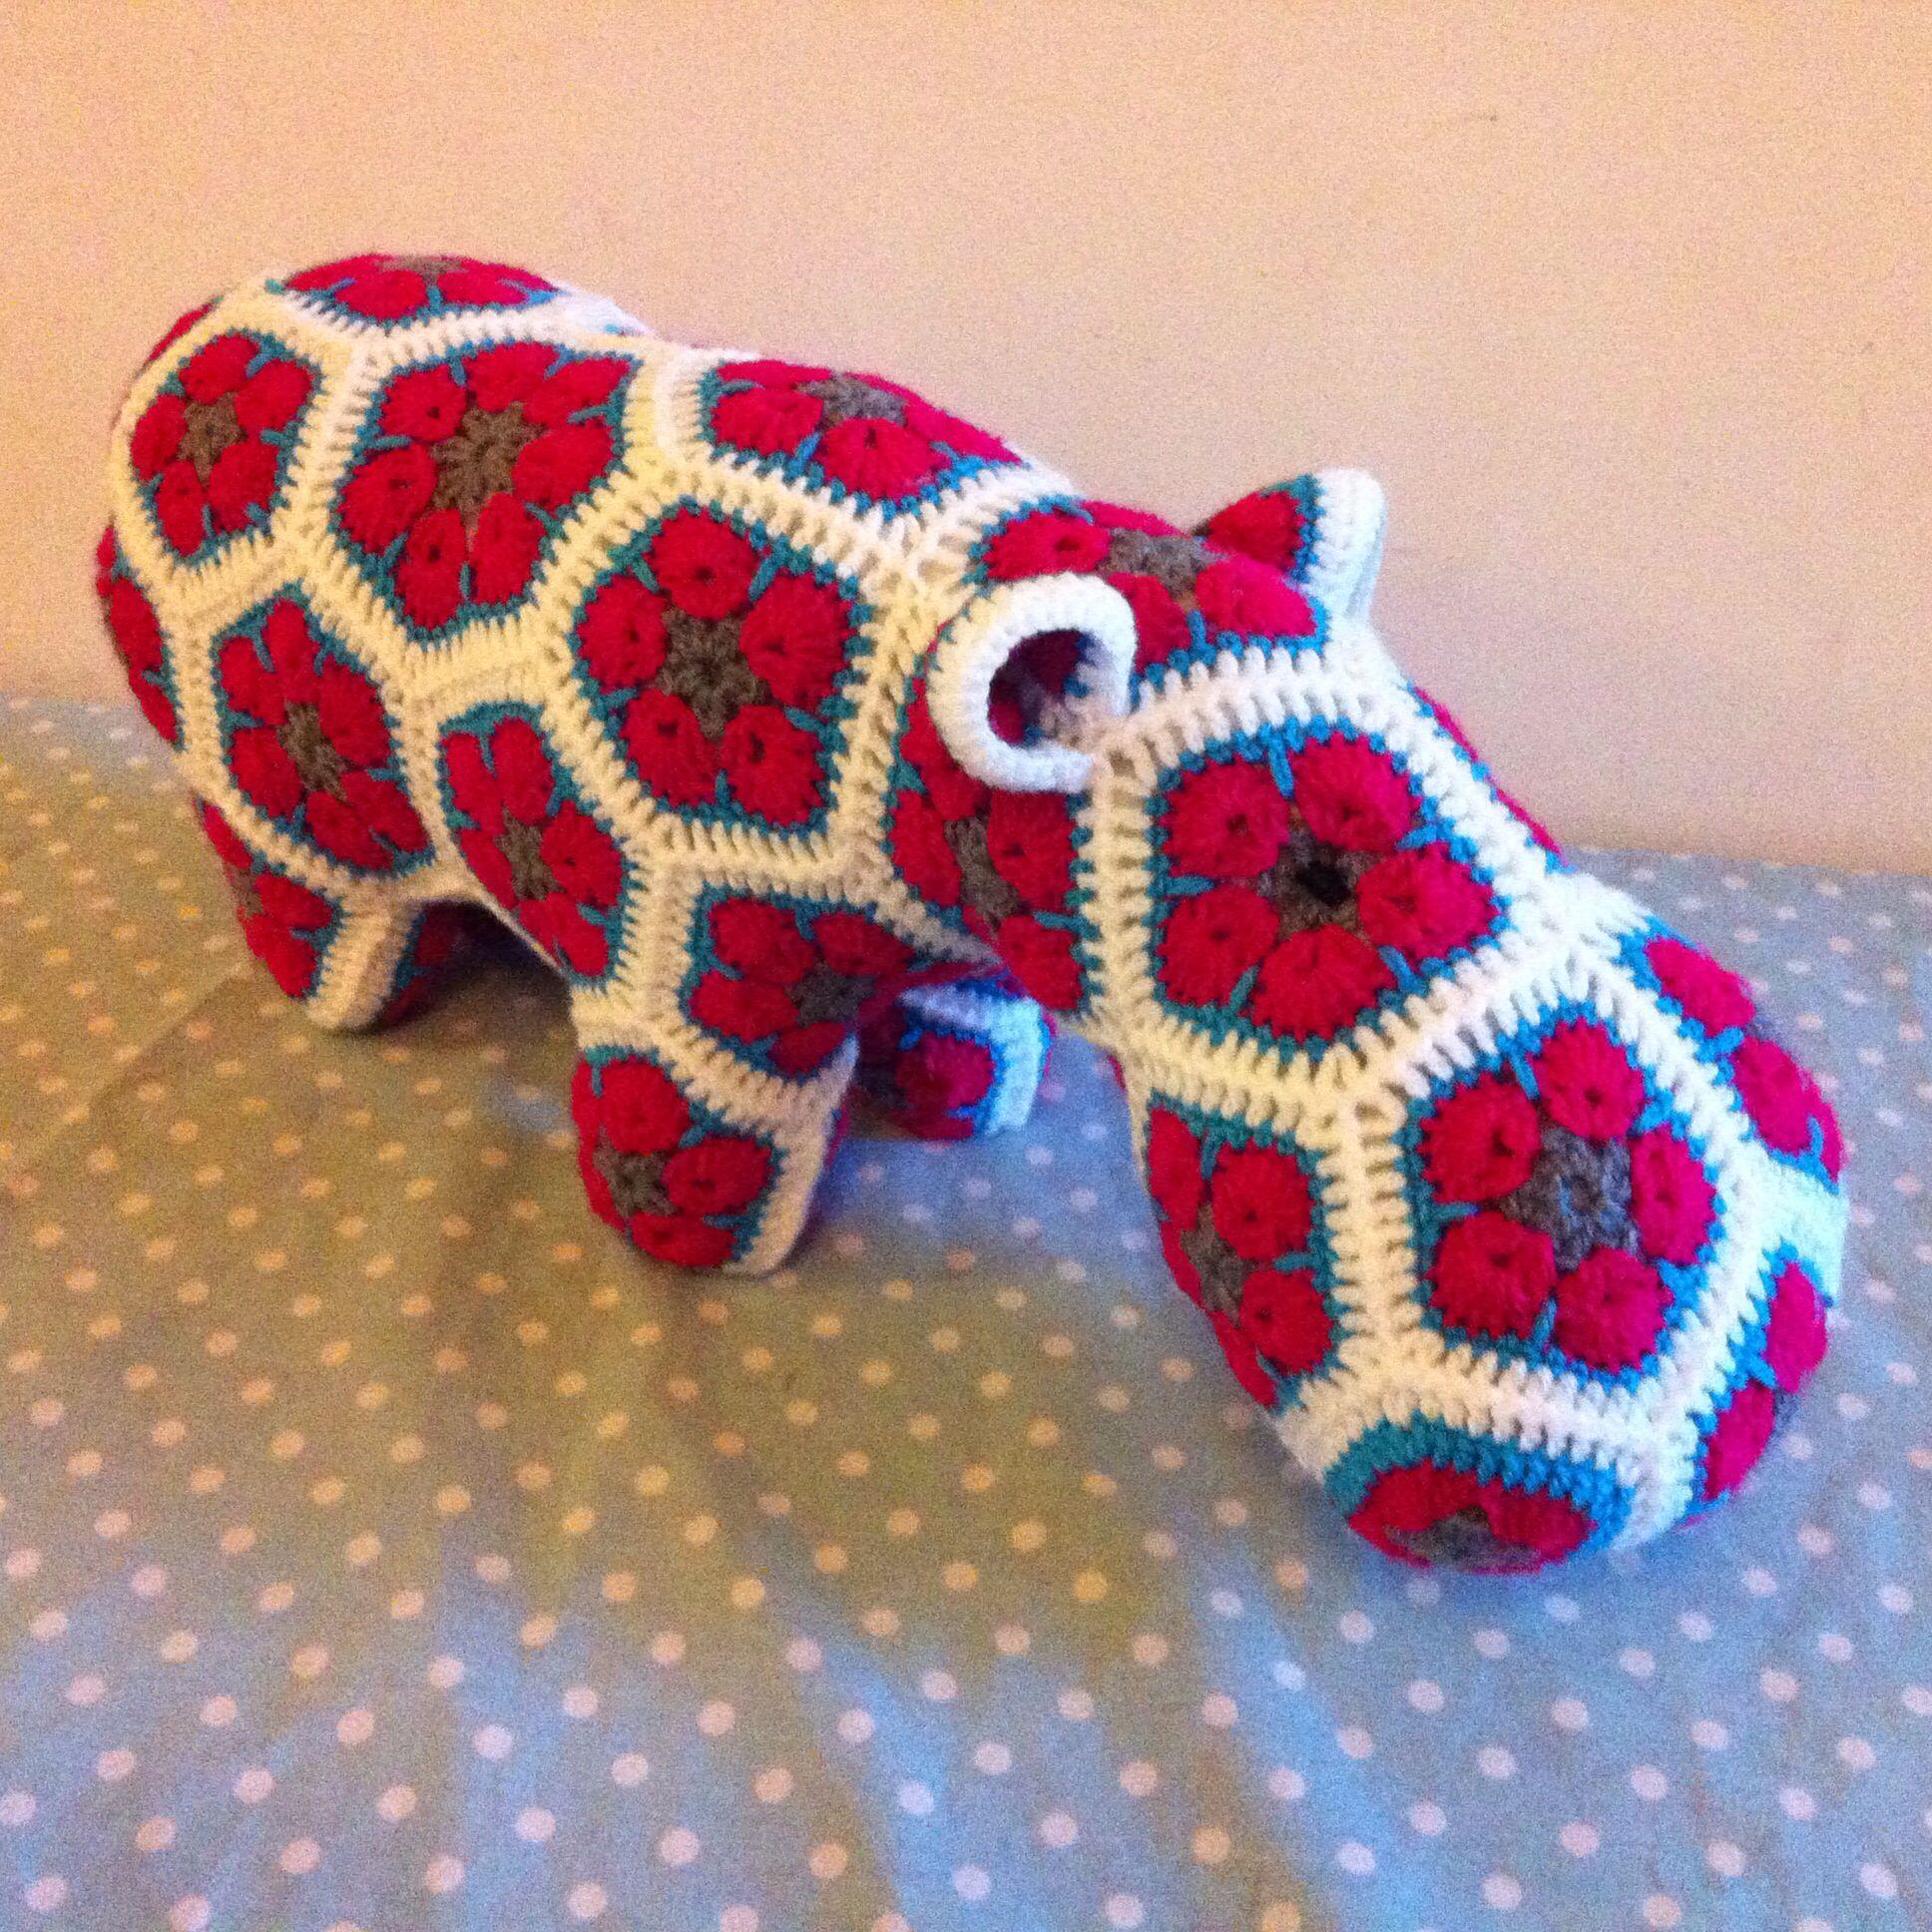 Crochet hippo - Happypotamus pattern by Heidibears | virkattu hippo ...